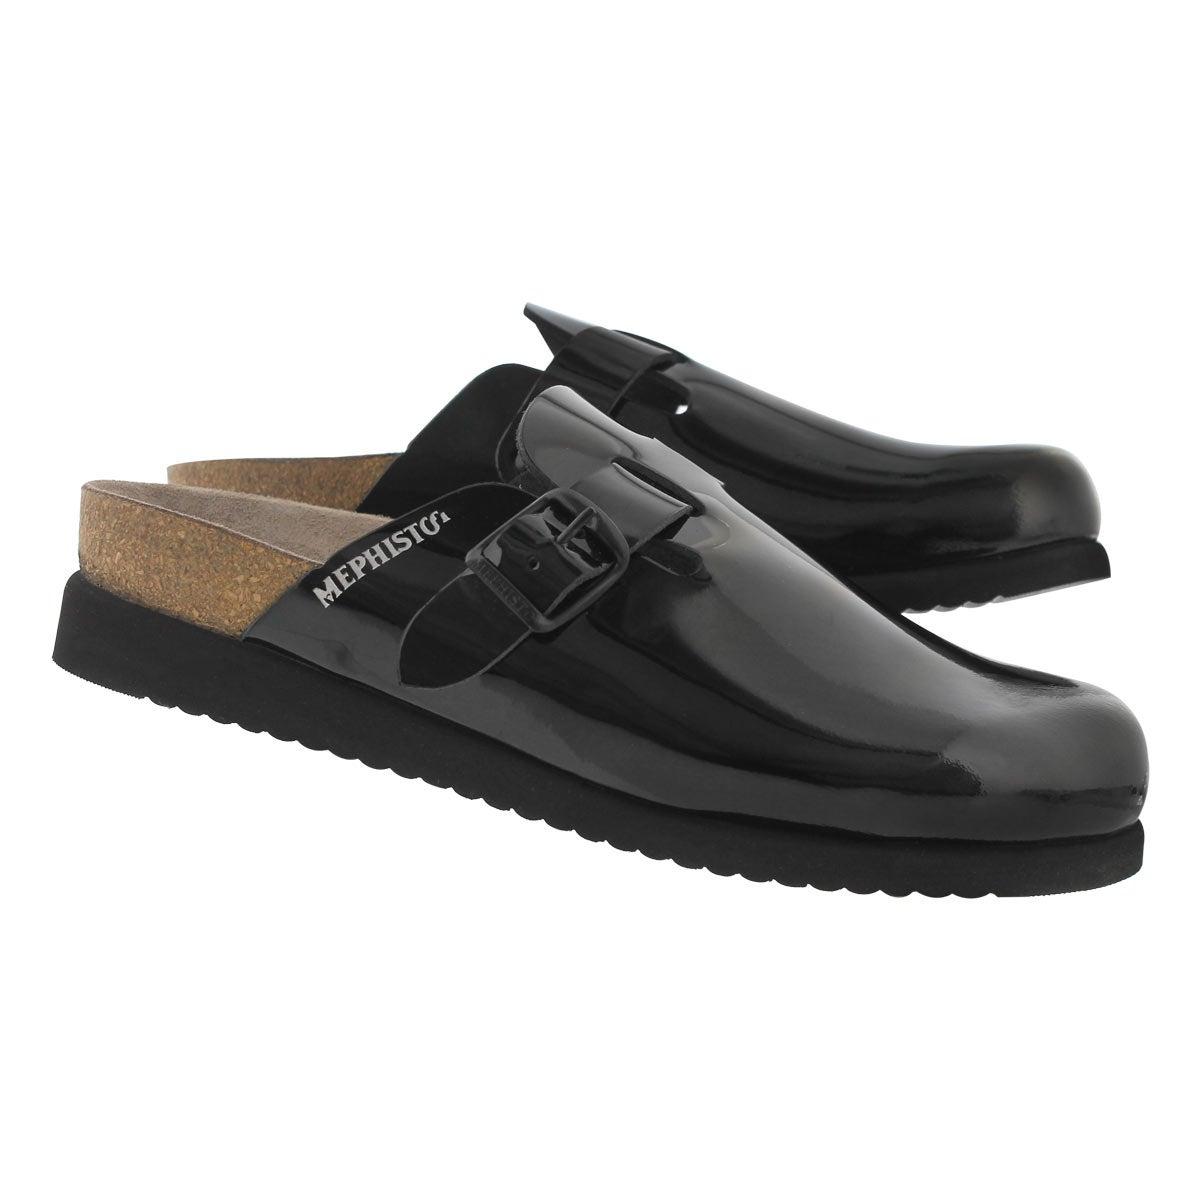 Lds Halina black pat cork footbed clog